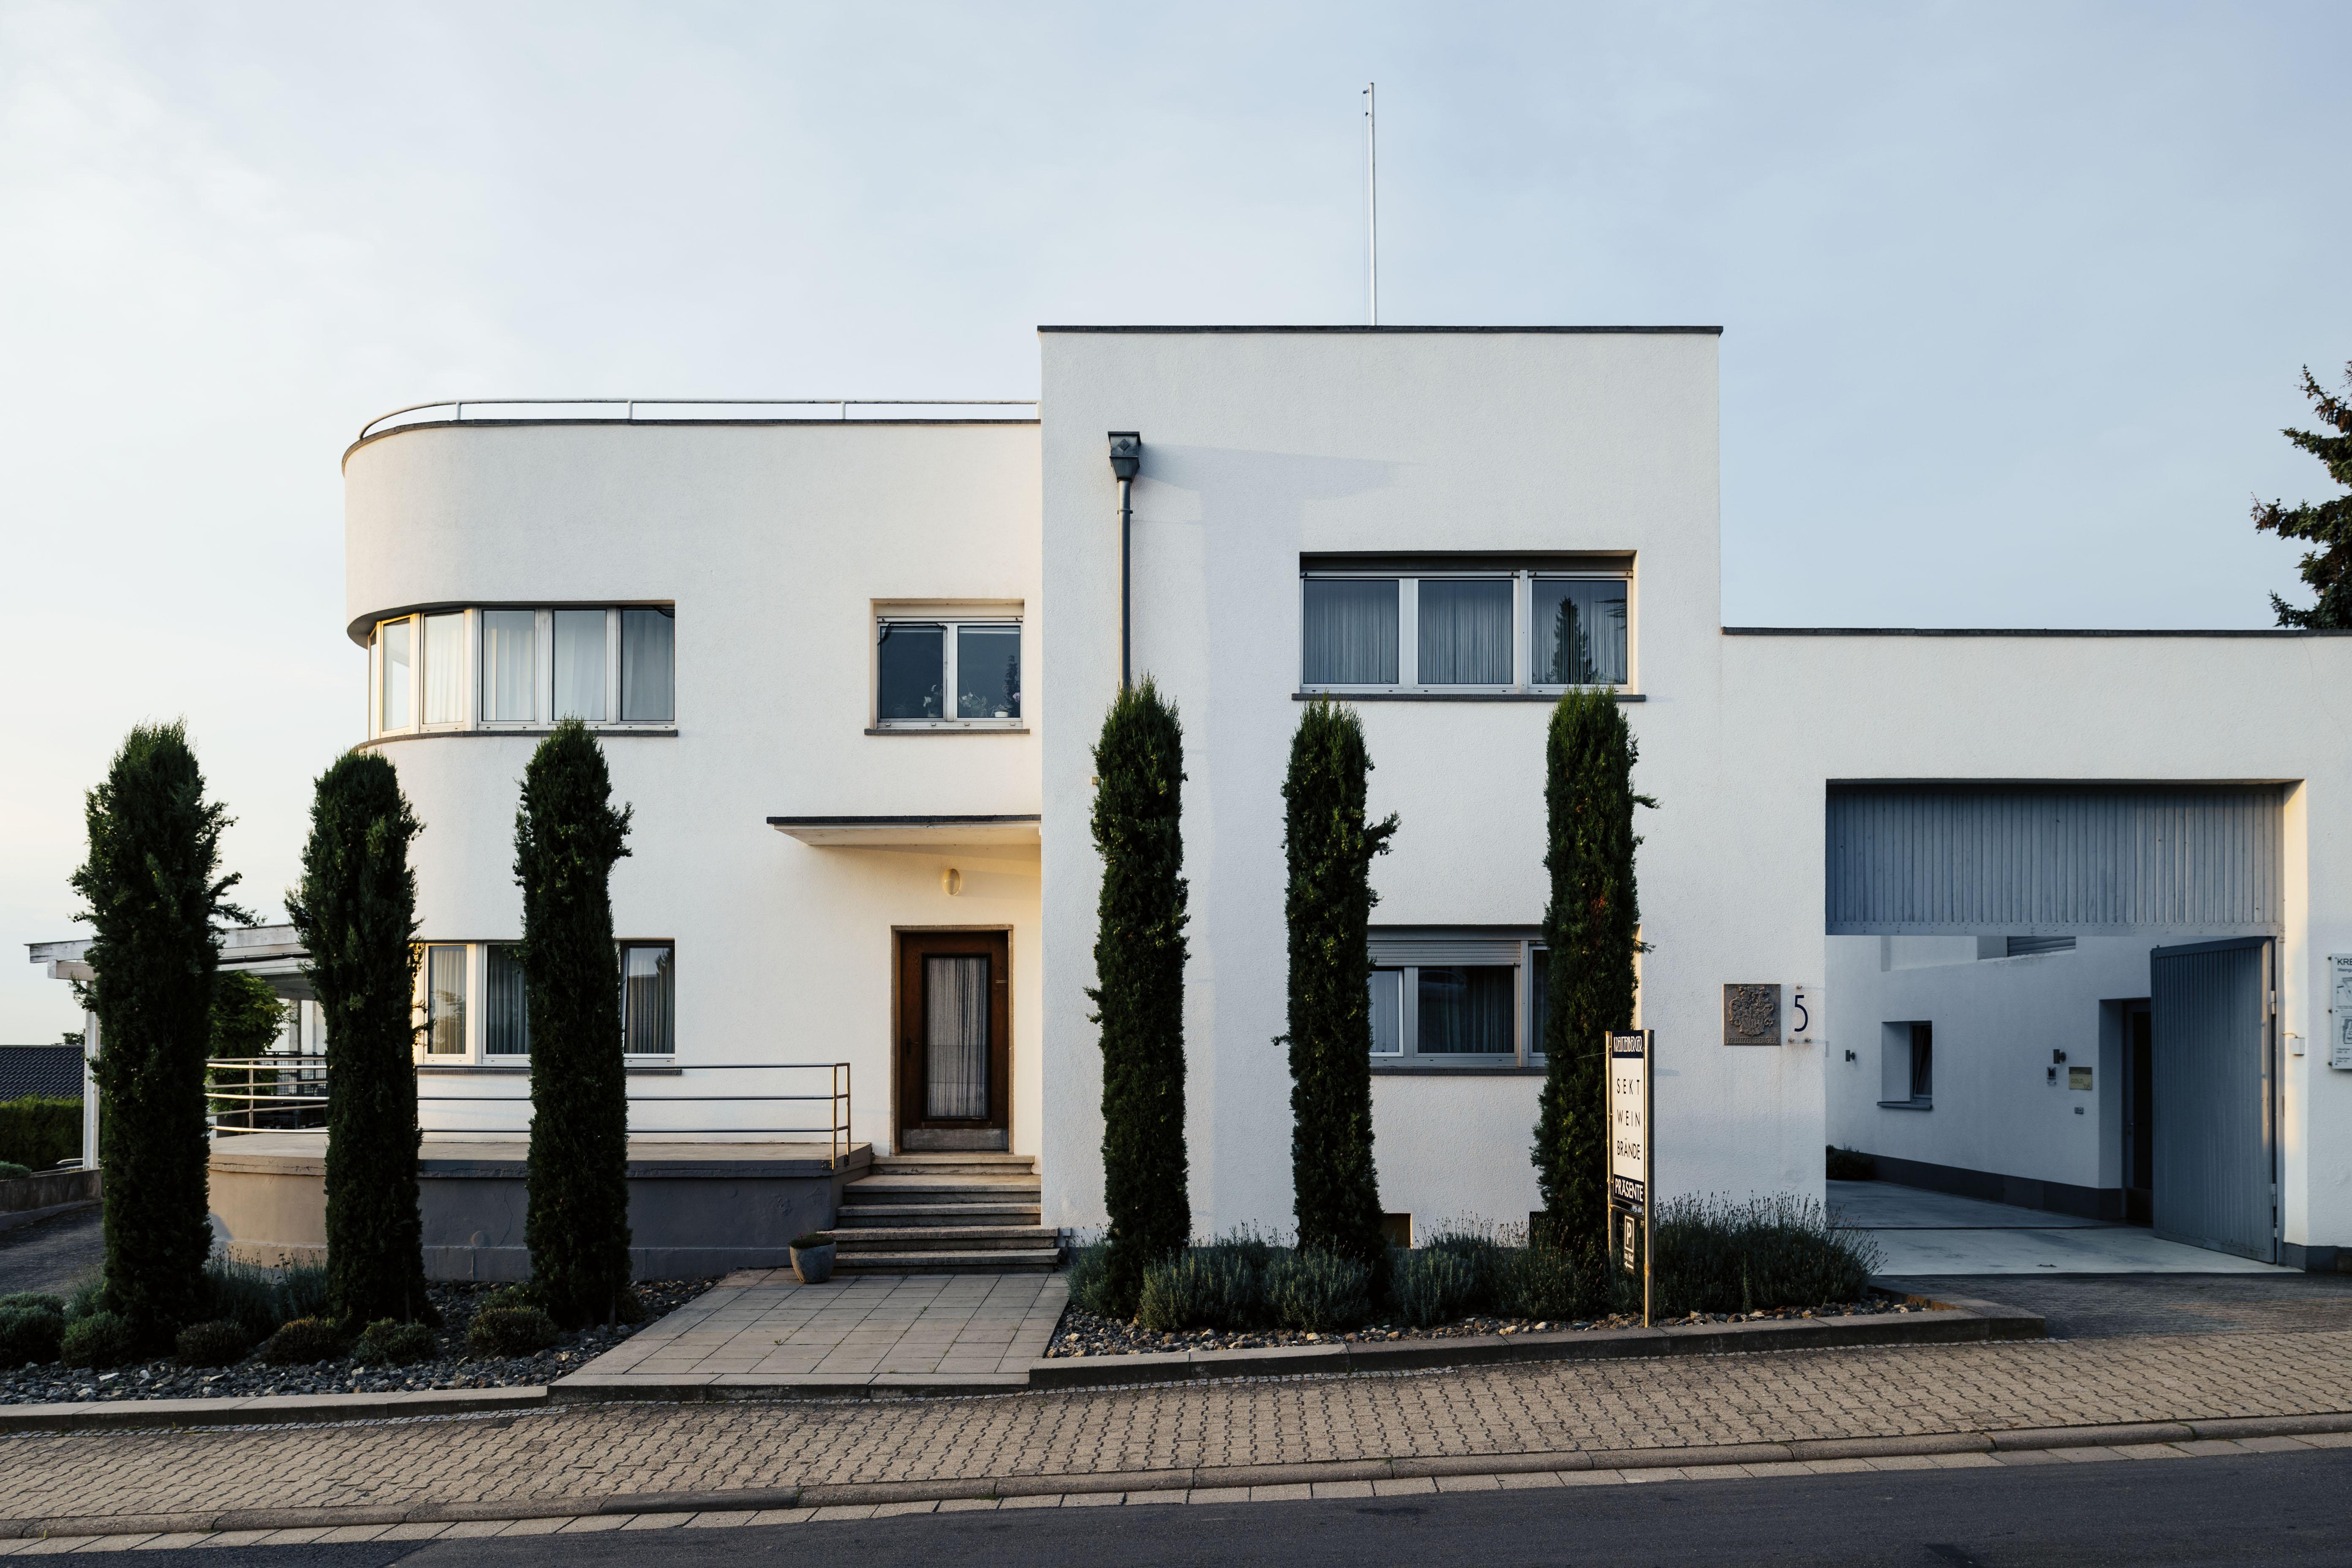 Weingut / Vineyard Kreutzenberger (1929/30), Architekt / architect: Otto Prott Photo: © Tillmann Franzen, tillmannfranzen.com